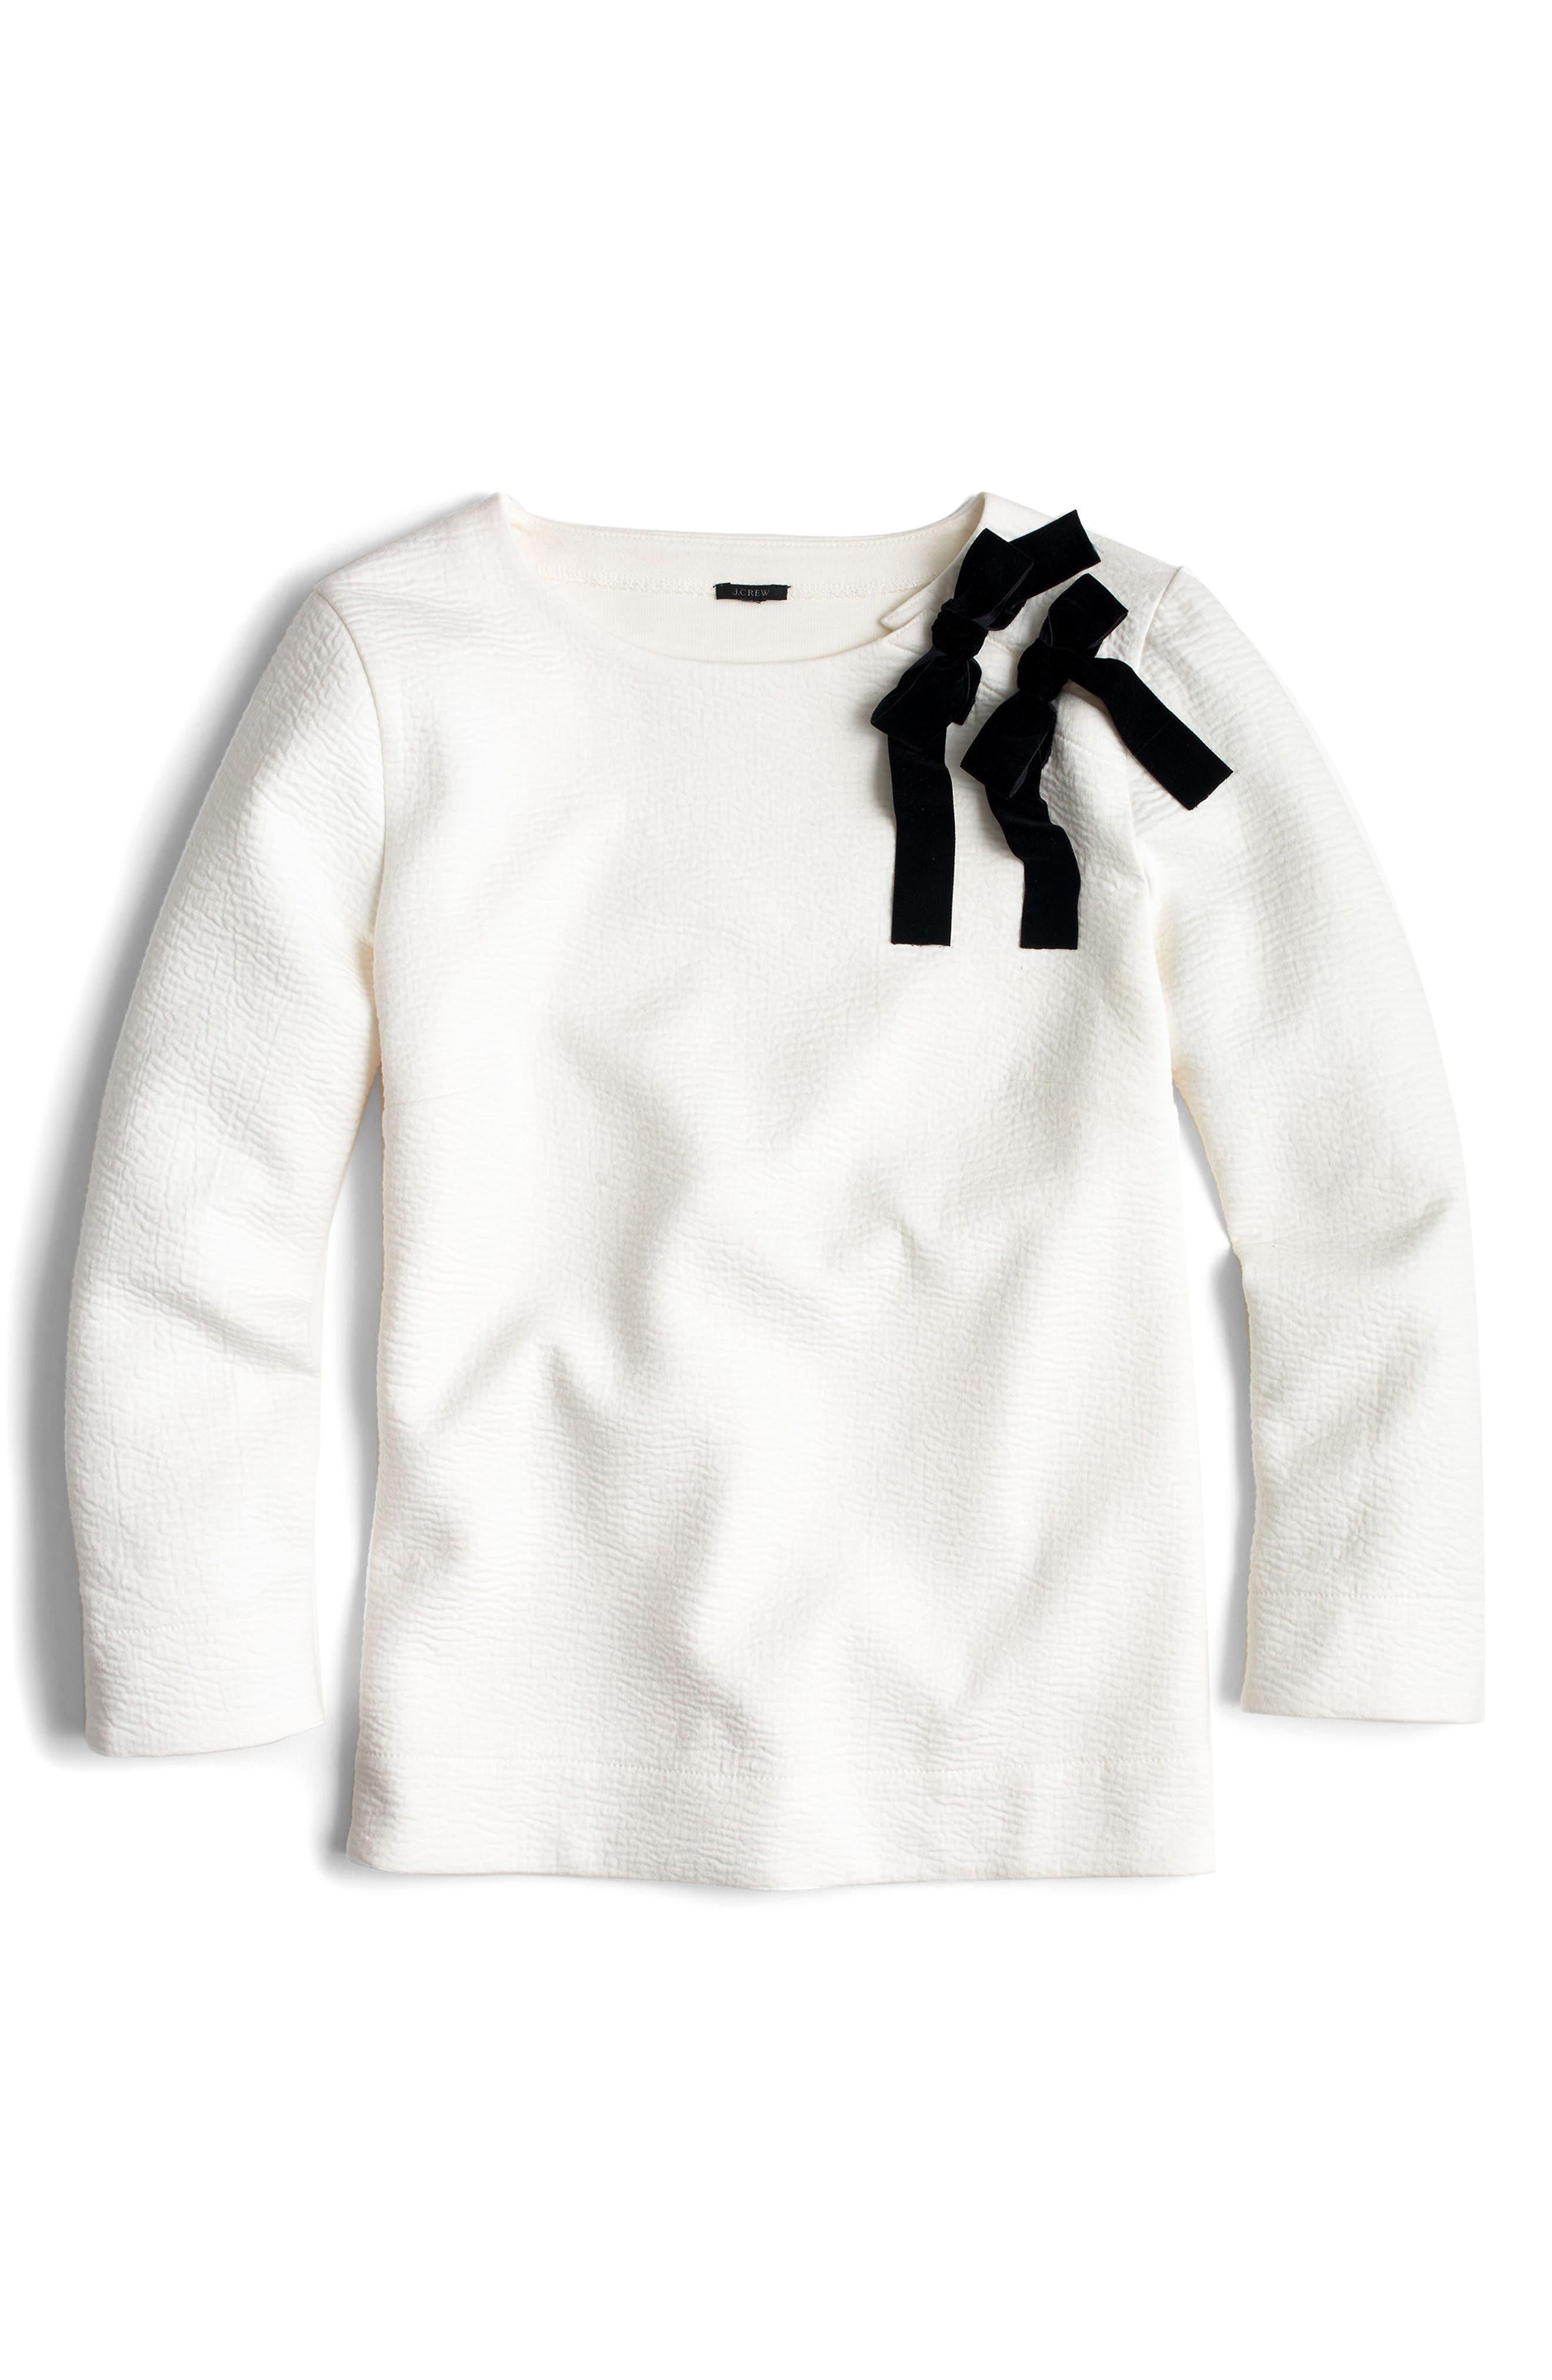 Double Bow Sweatshirt,                         Main,                         color, Ivory